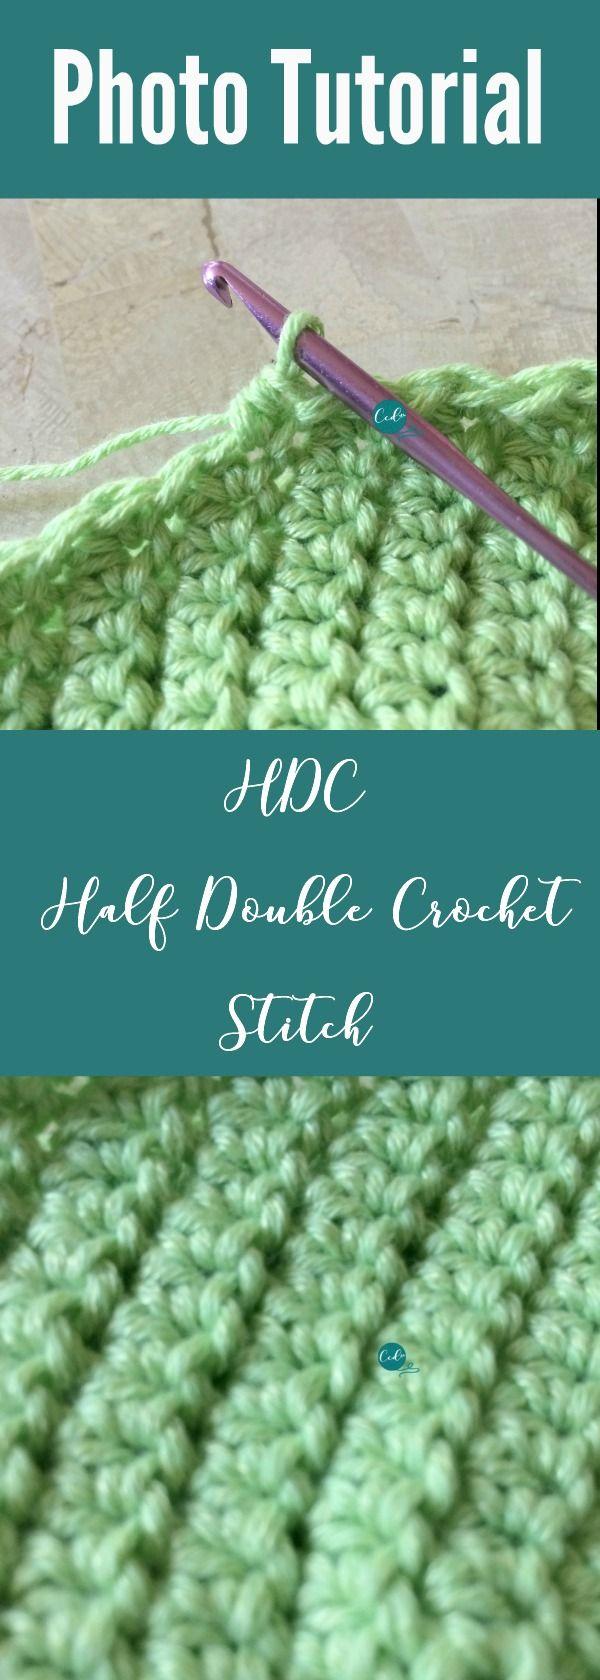 Half double crochet stitch photo tutorial | HDC photo tutorial | crochet basics | learn to crochet | how to crochet half double crochet | learn to HDC | HDC crochet tutorial | HDC crochet stitch